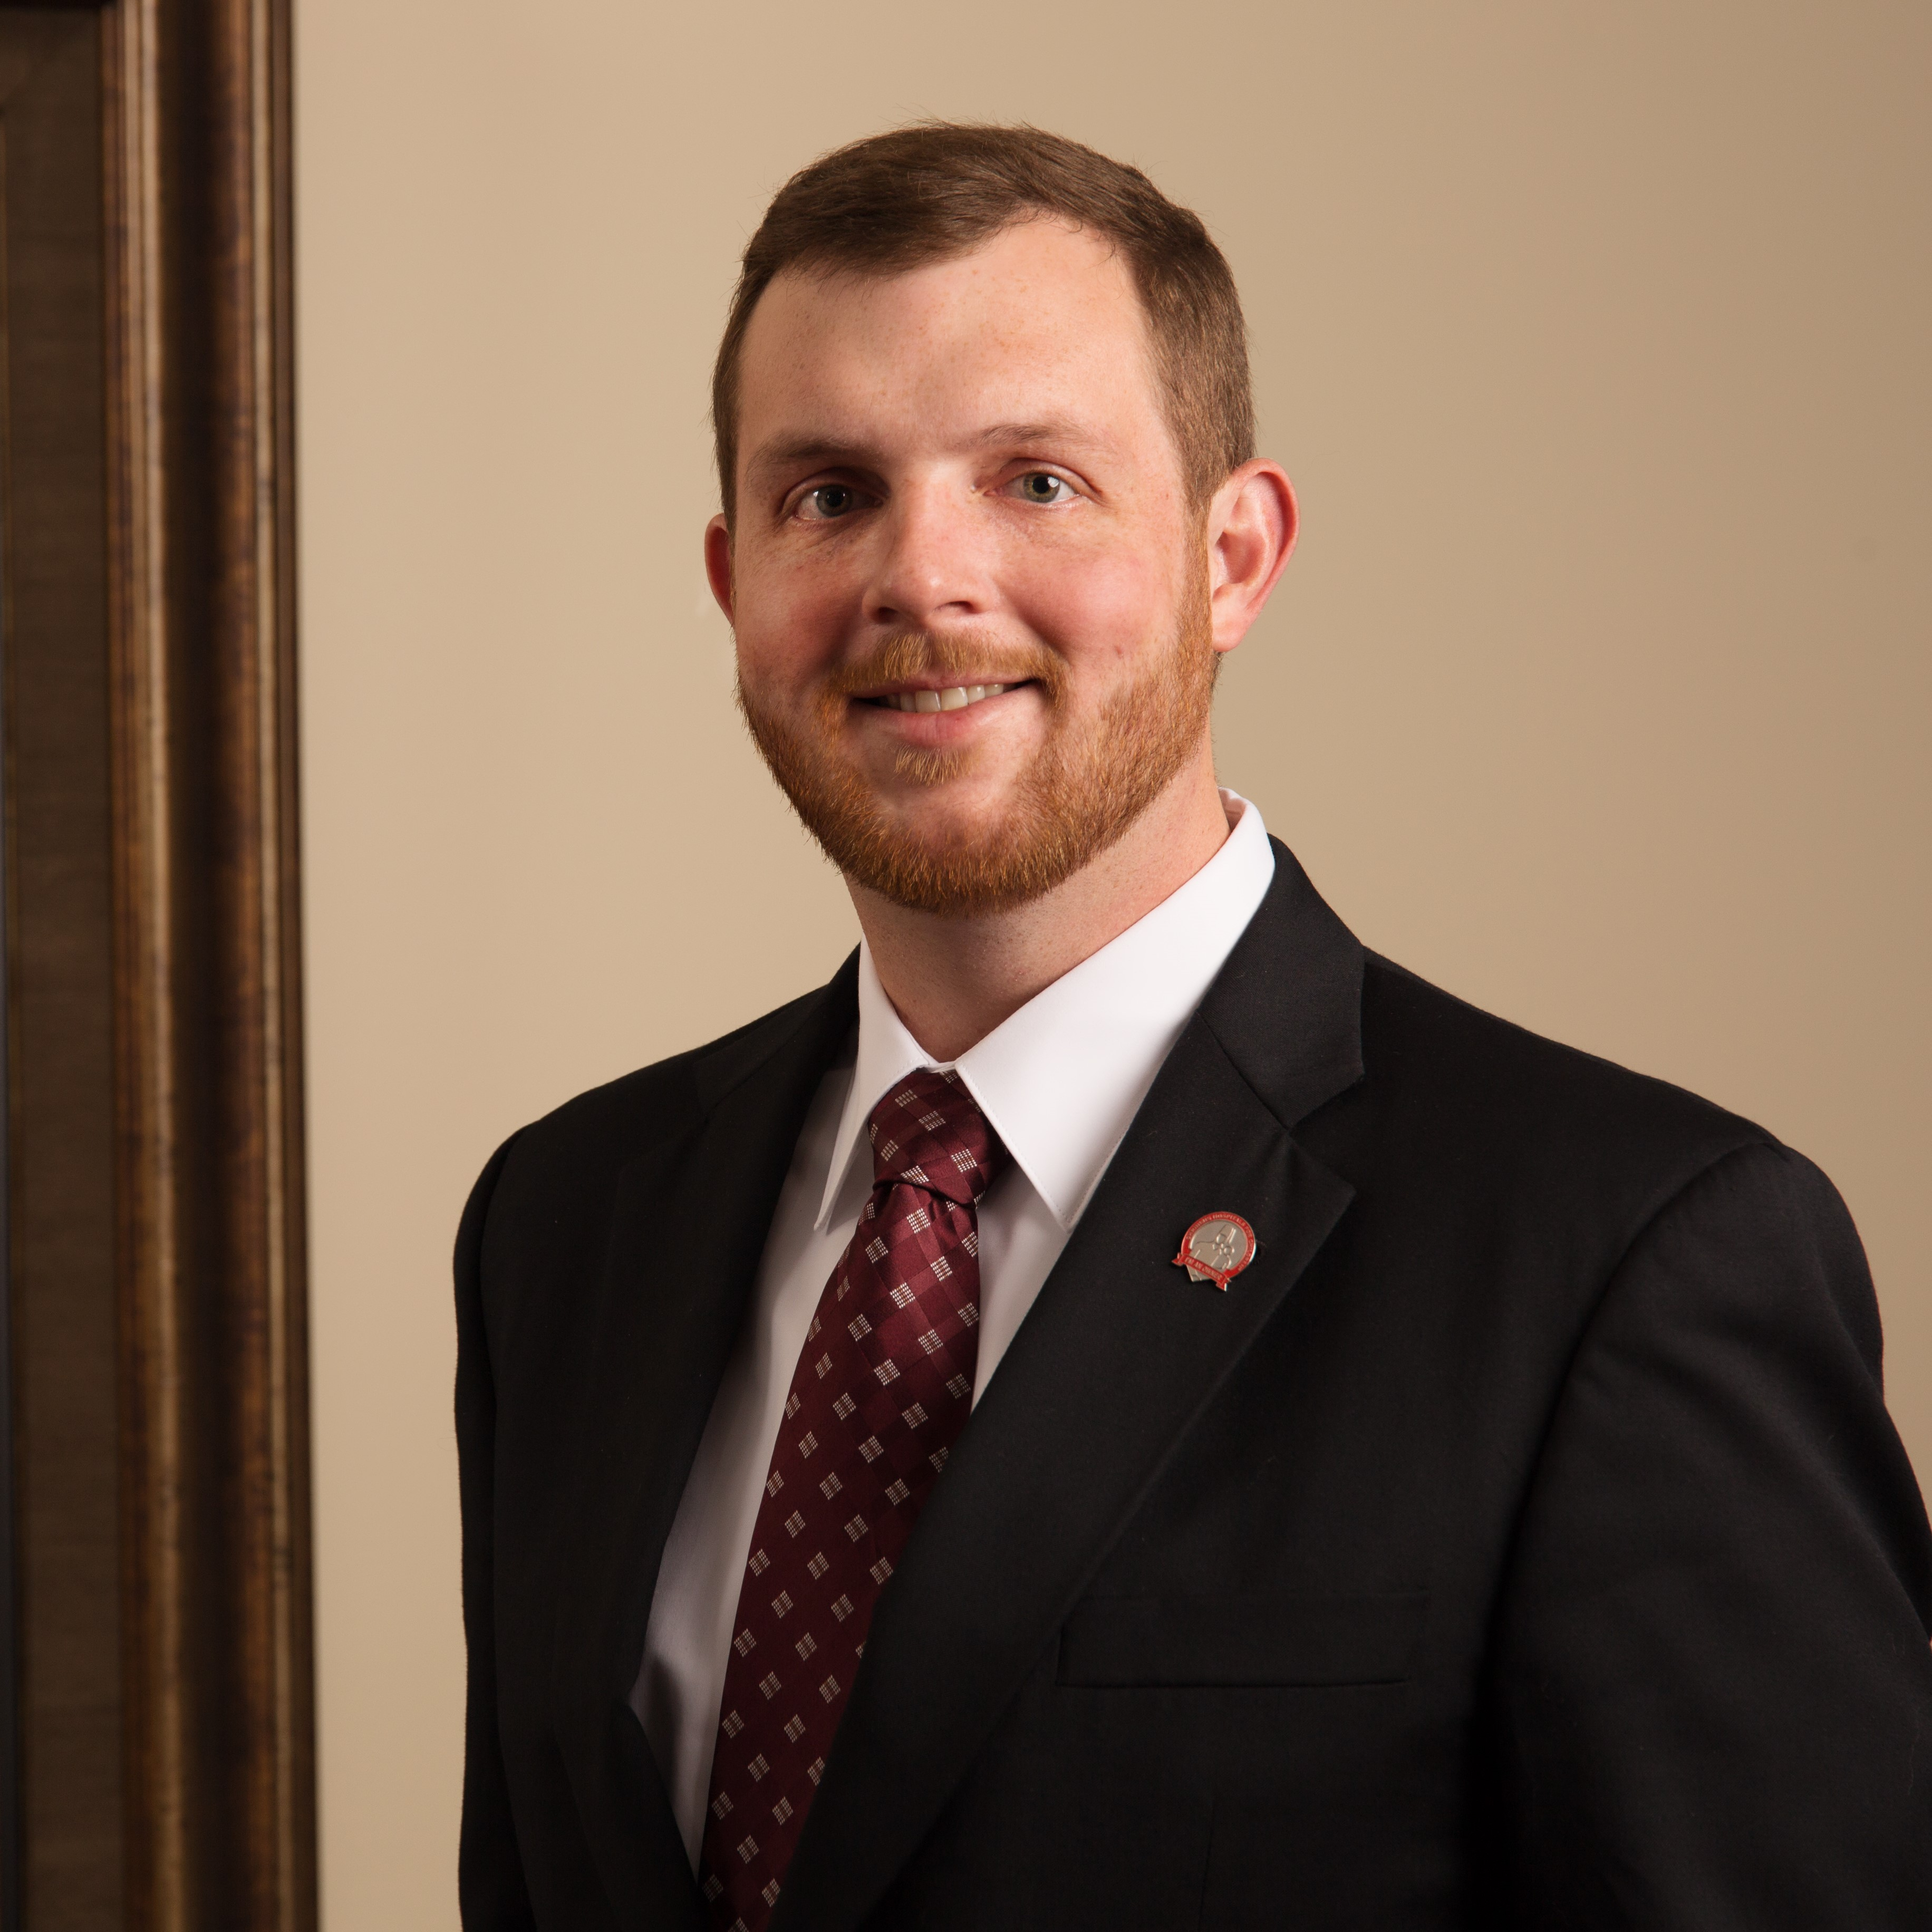 Kiel Vanderveen, financial advisor Nebraska City NE